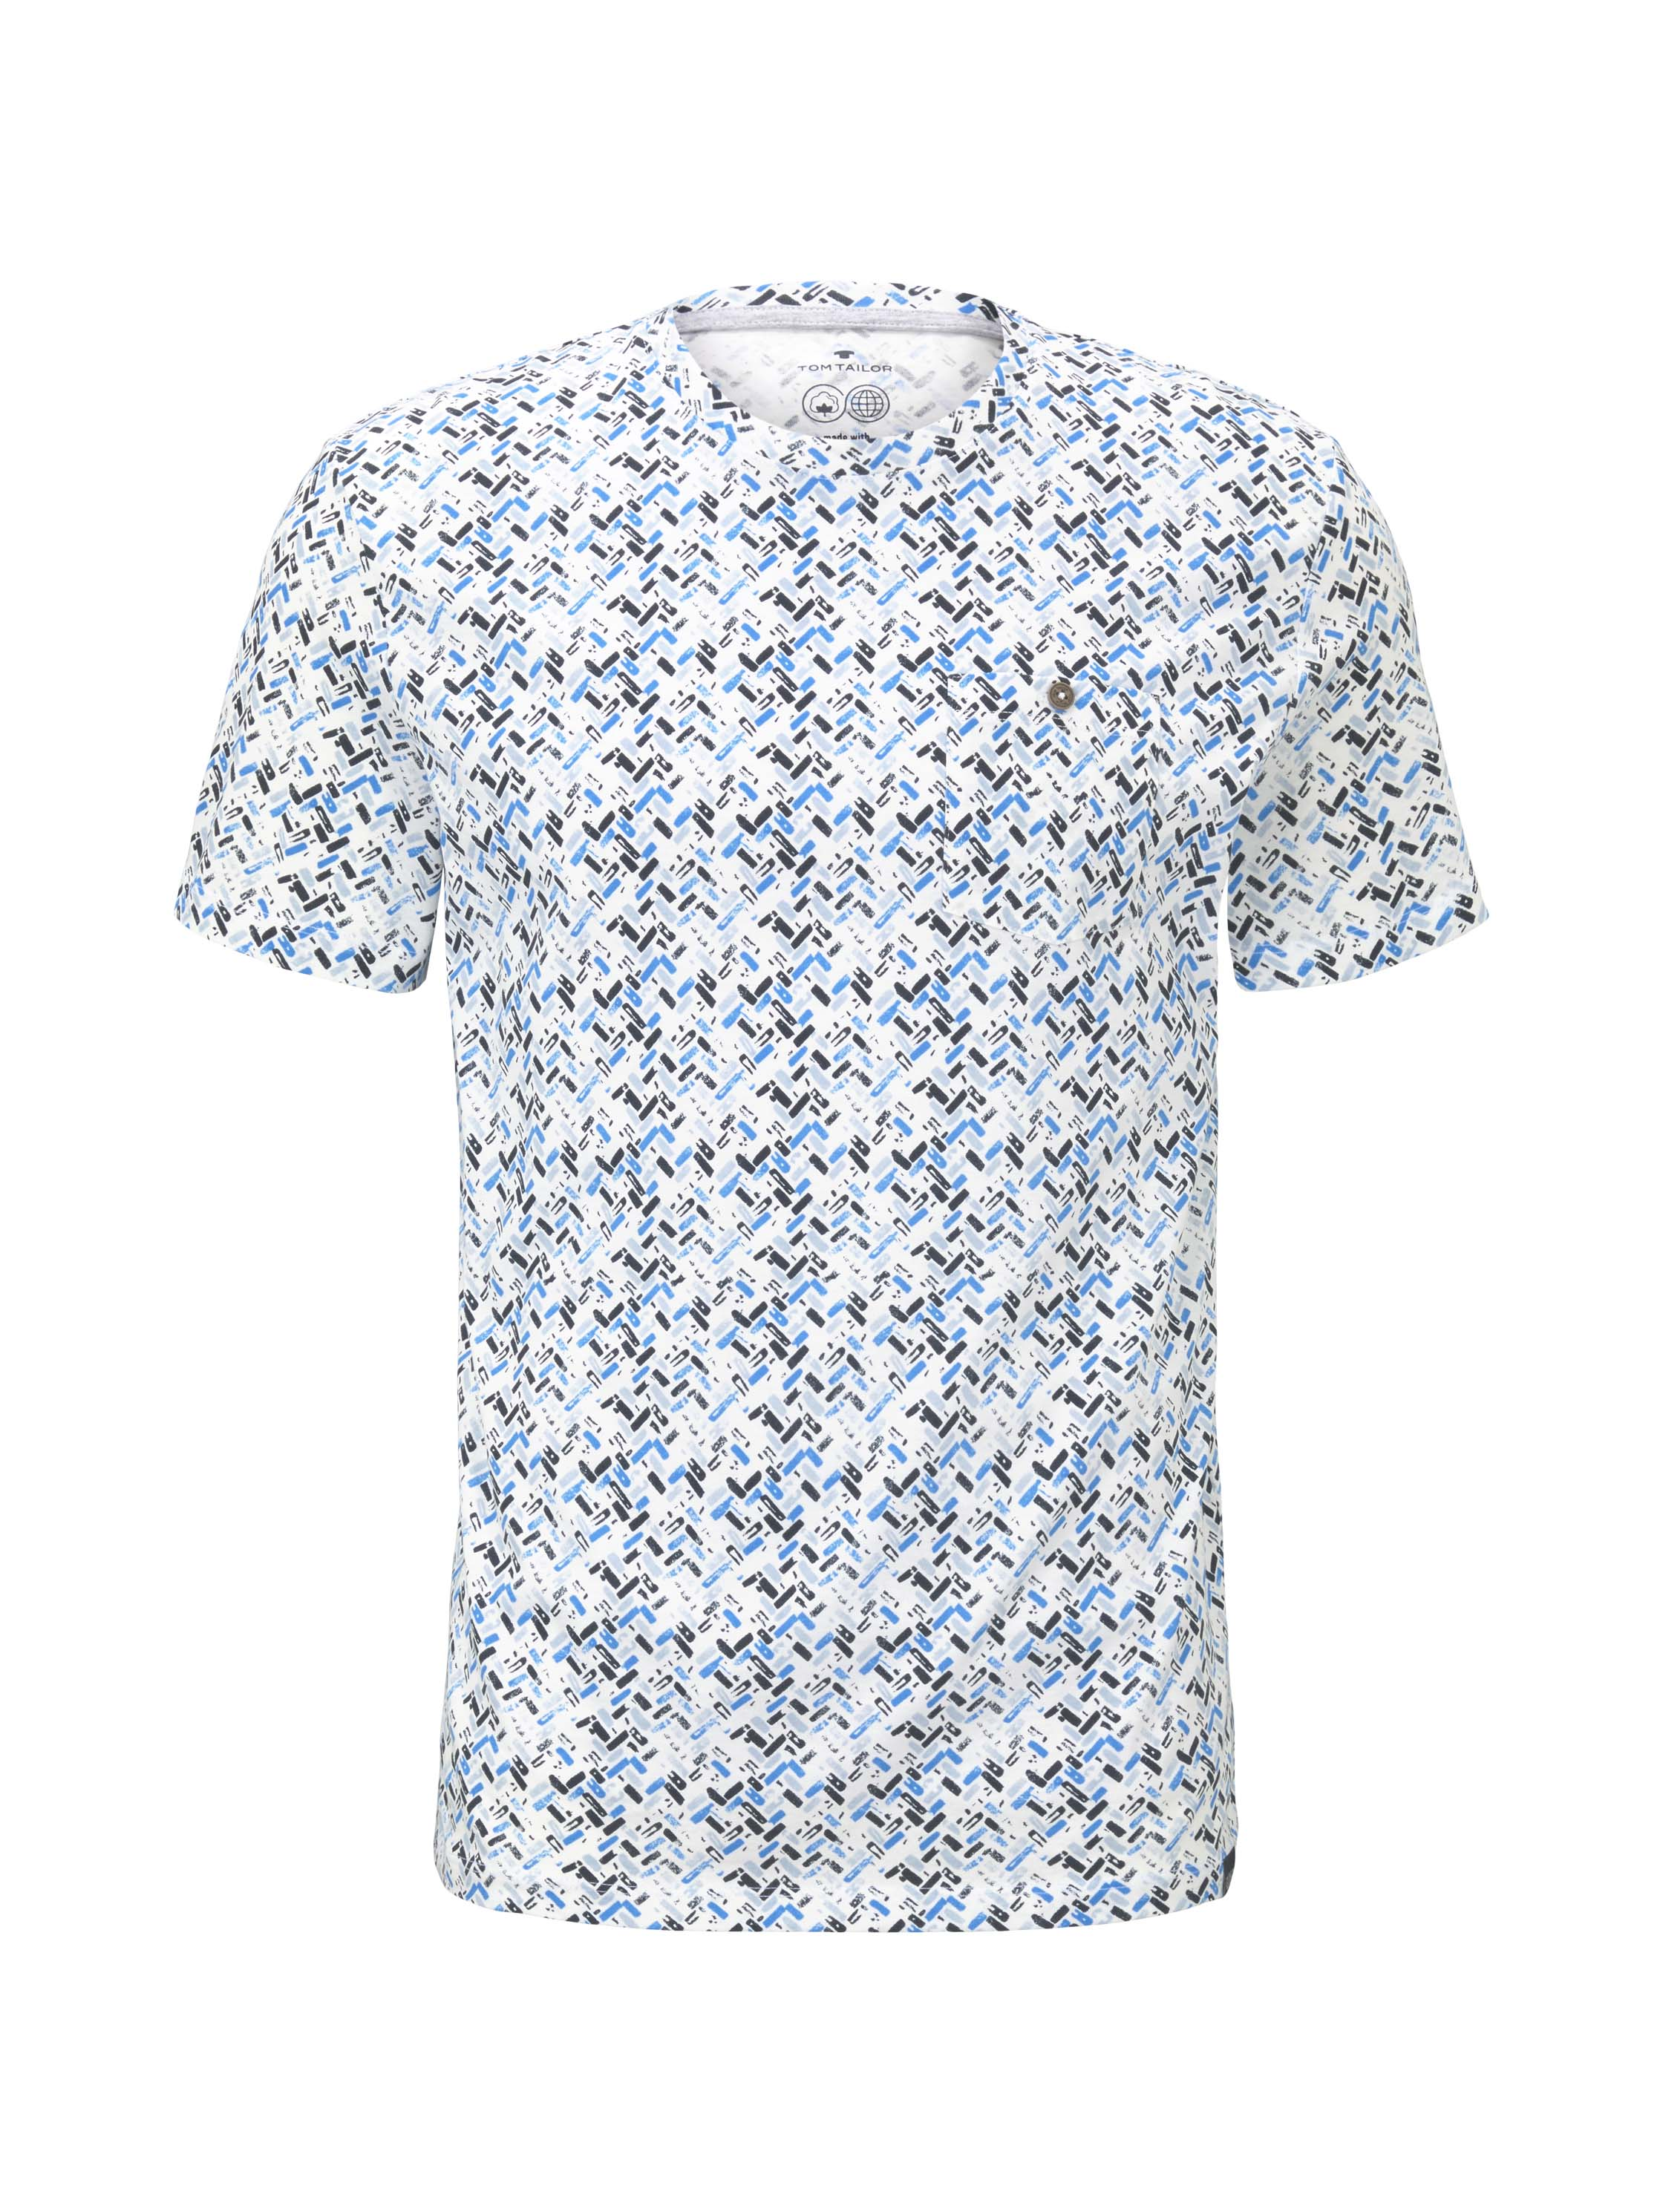 allover printed t-shirt, white base blue shades design